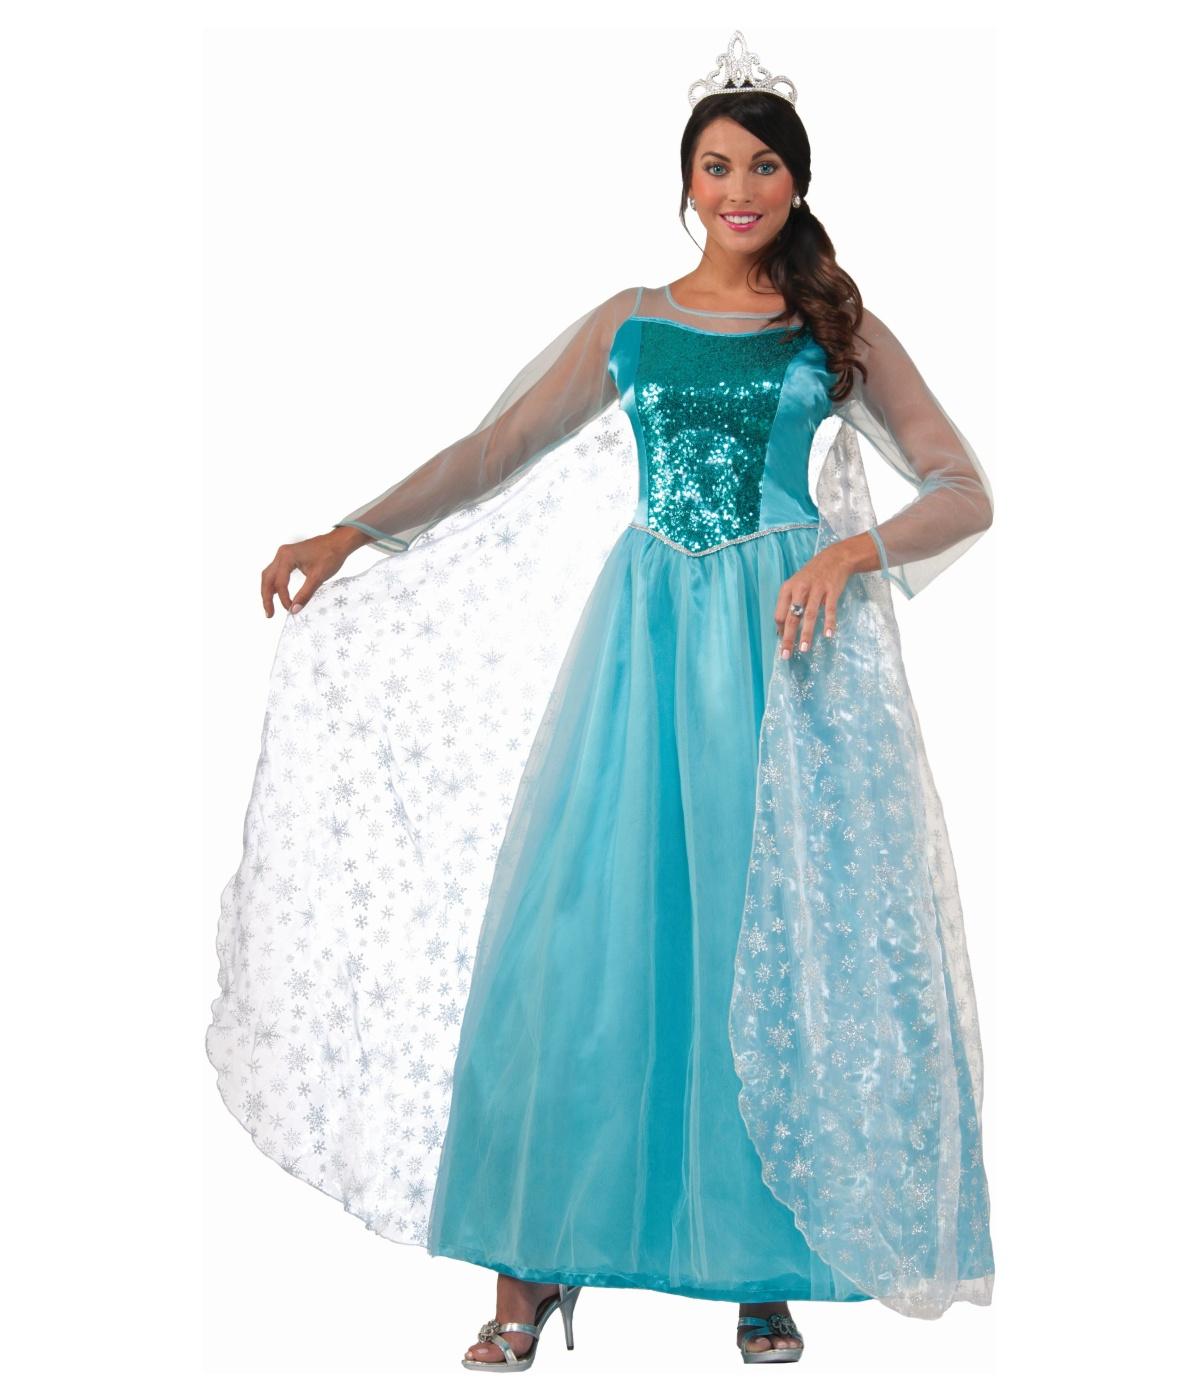 costumes adult costumes women costumes krystal ice